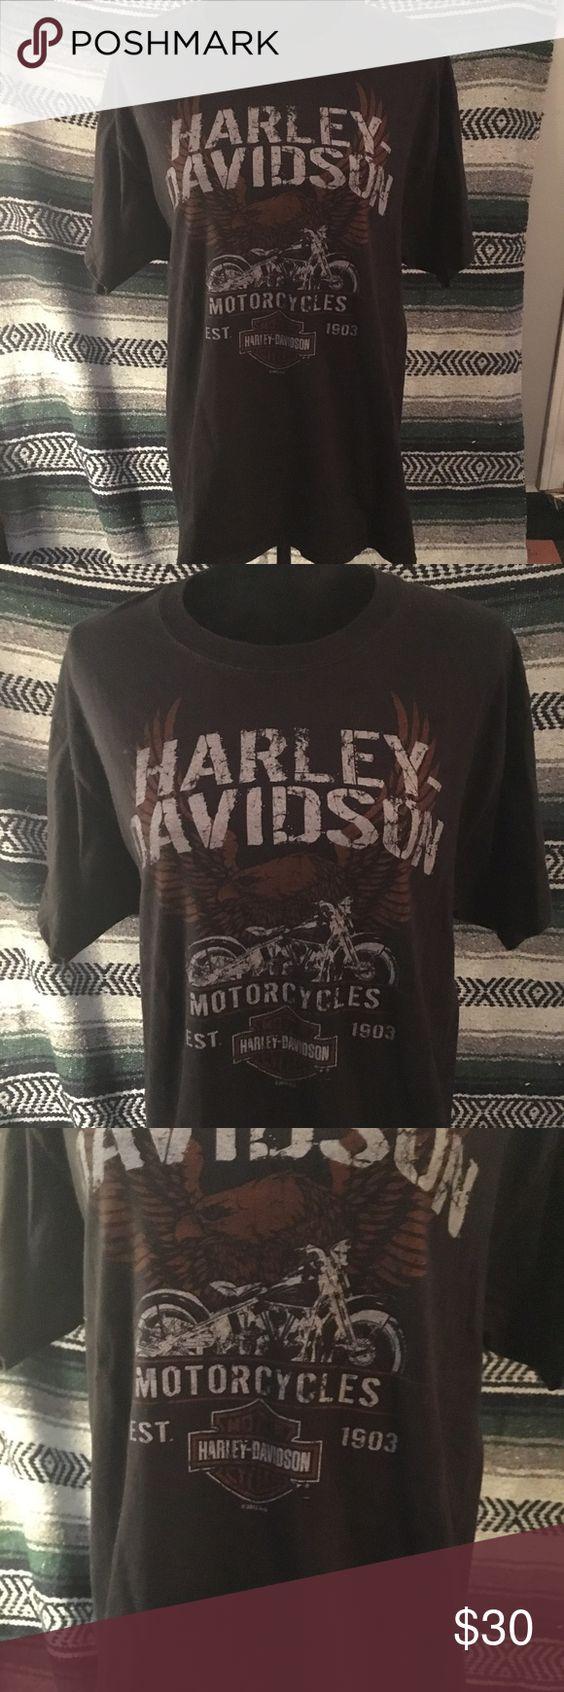 Harley davidson road glide custom motorcycles for sale kuala lumpur mudah my 2010 150k harley davidson pinterest road glide custom